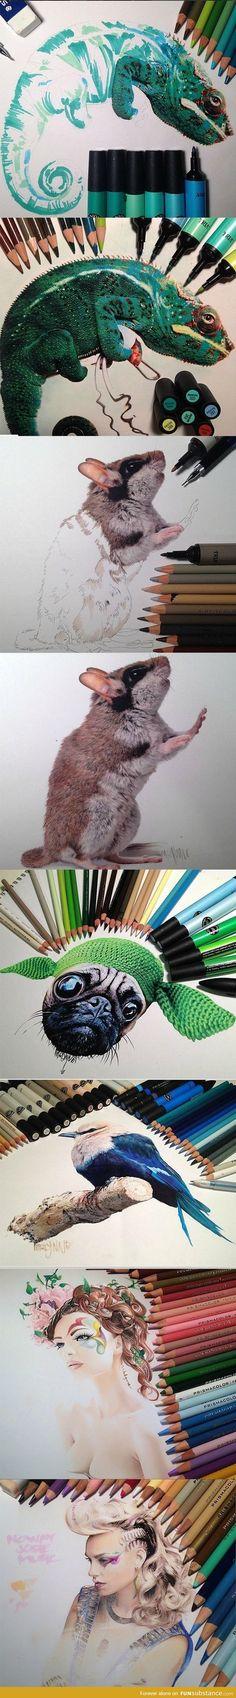 Photorealistic drawing skills